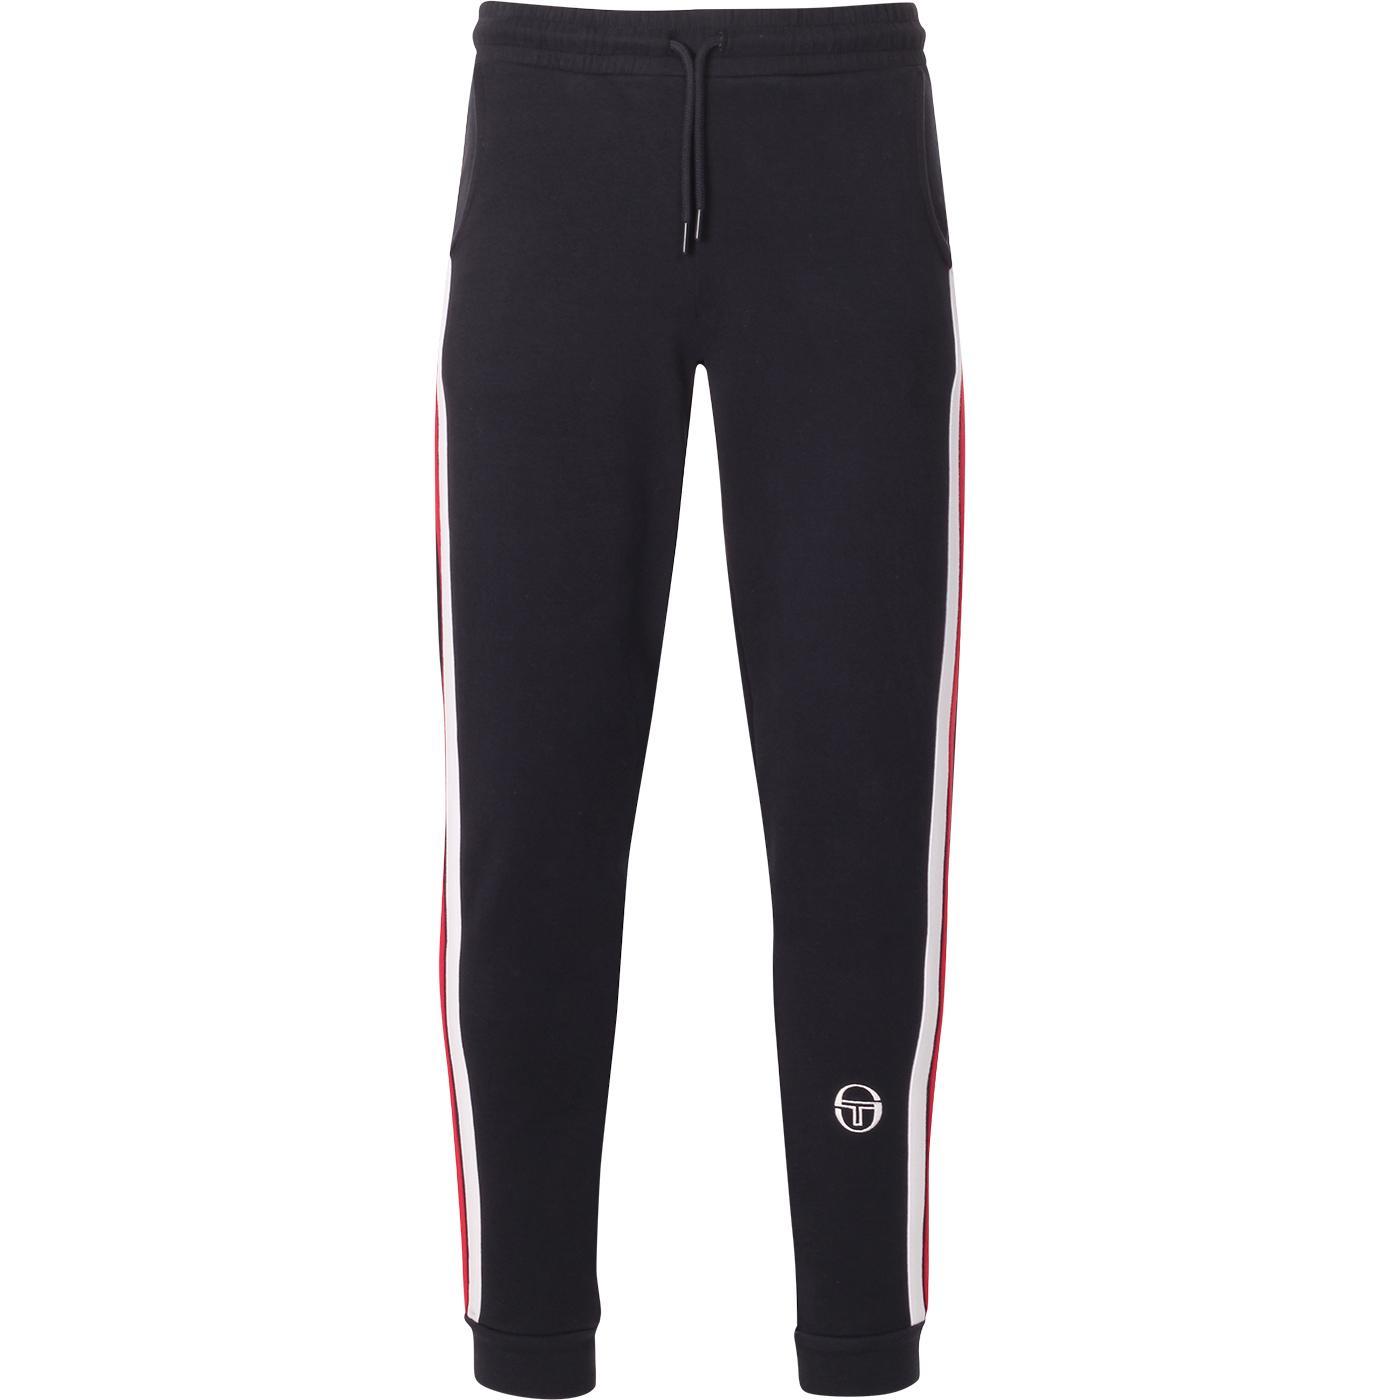 Grado SERGIO TACCHINI Stripe Jersey Track Pants NS